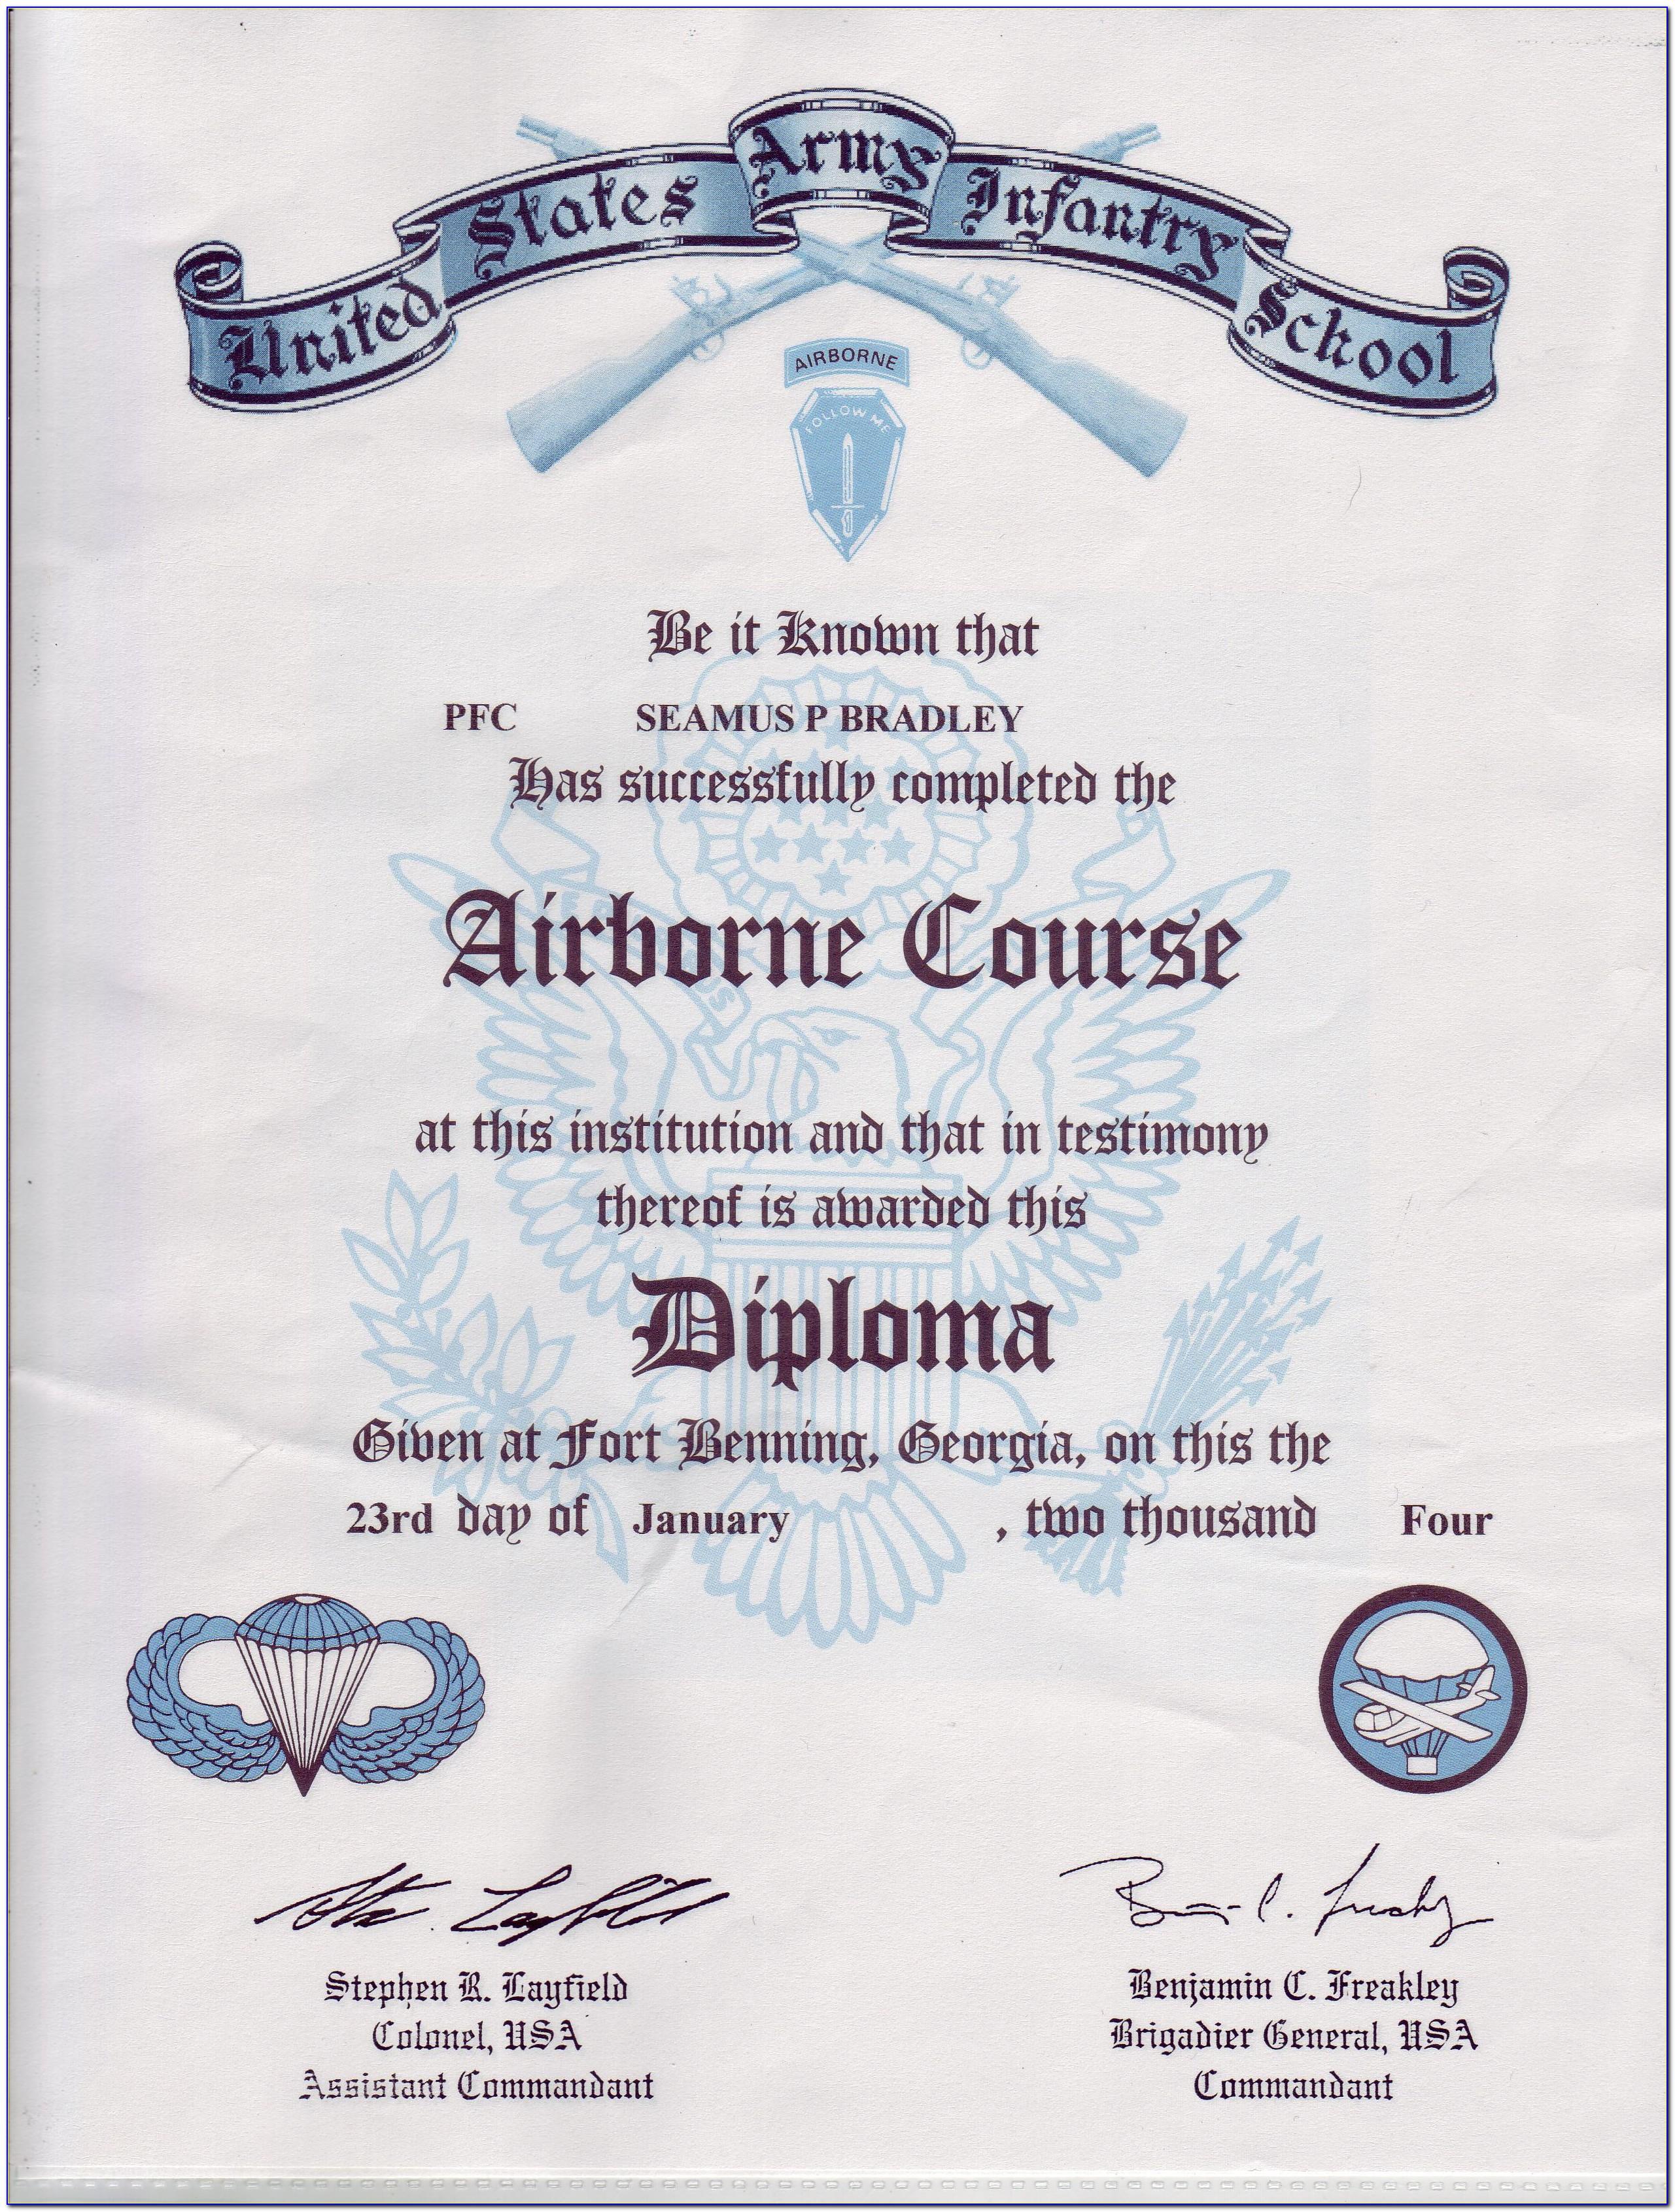 Emt Certification Galveston College